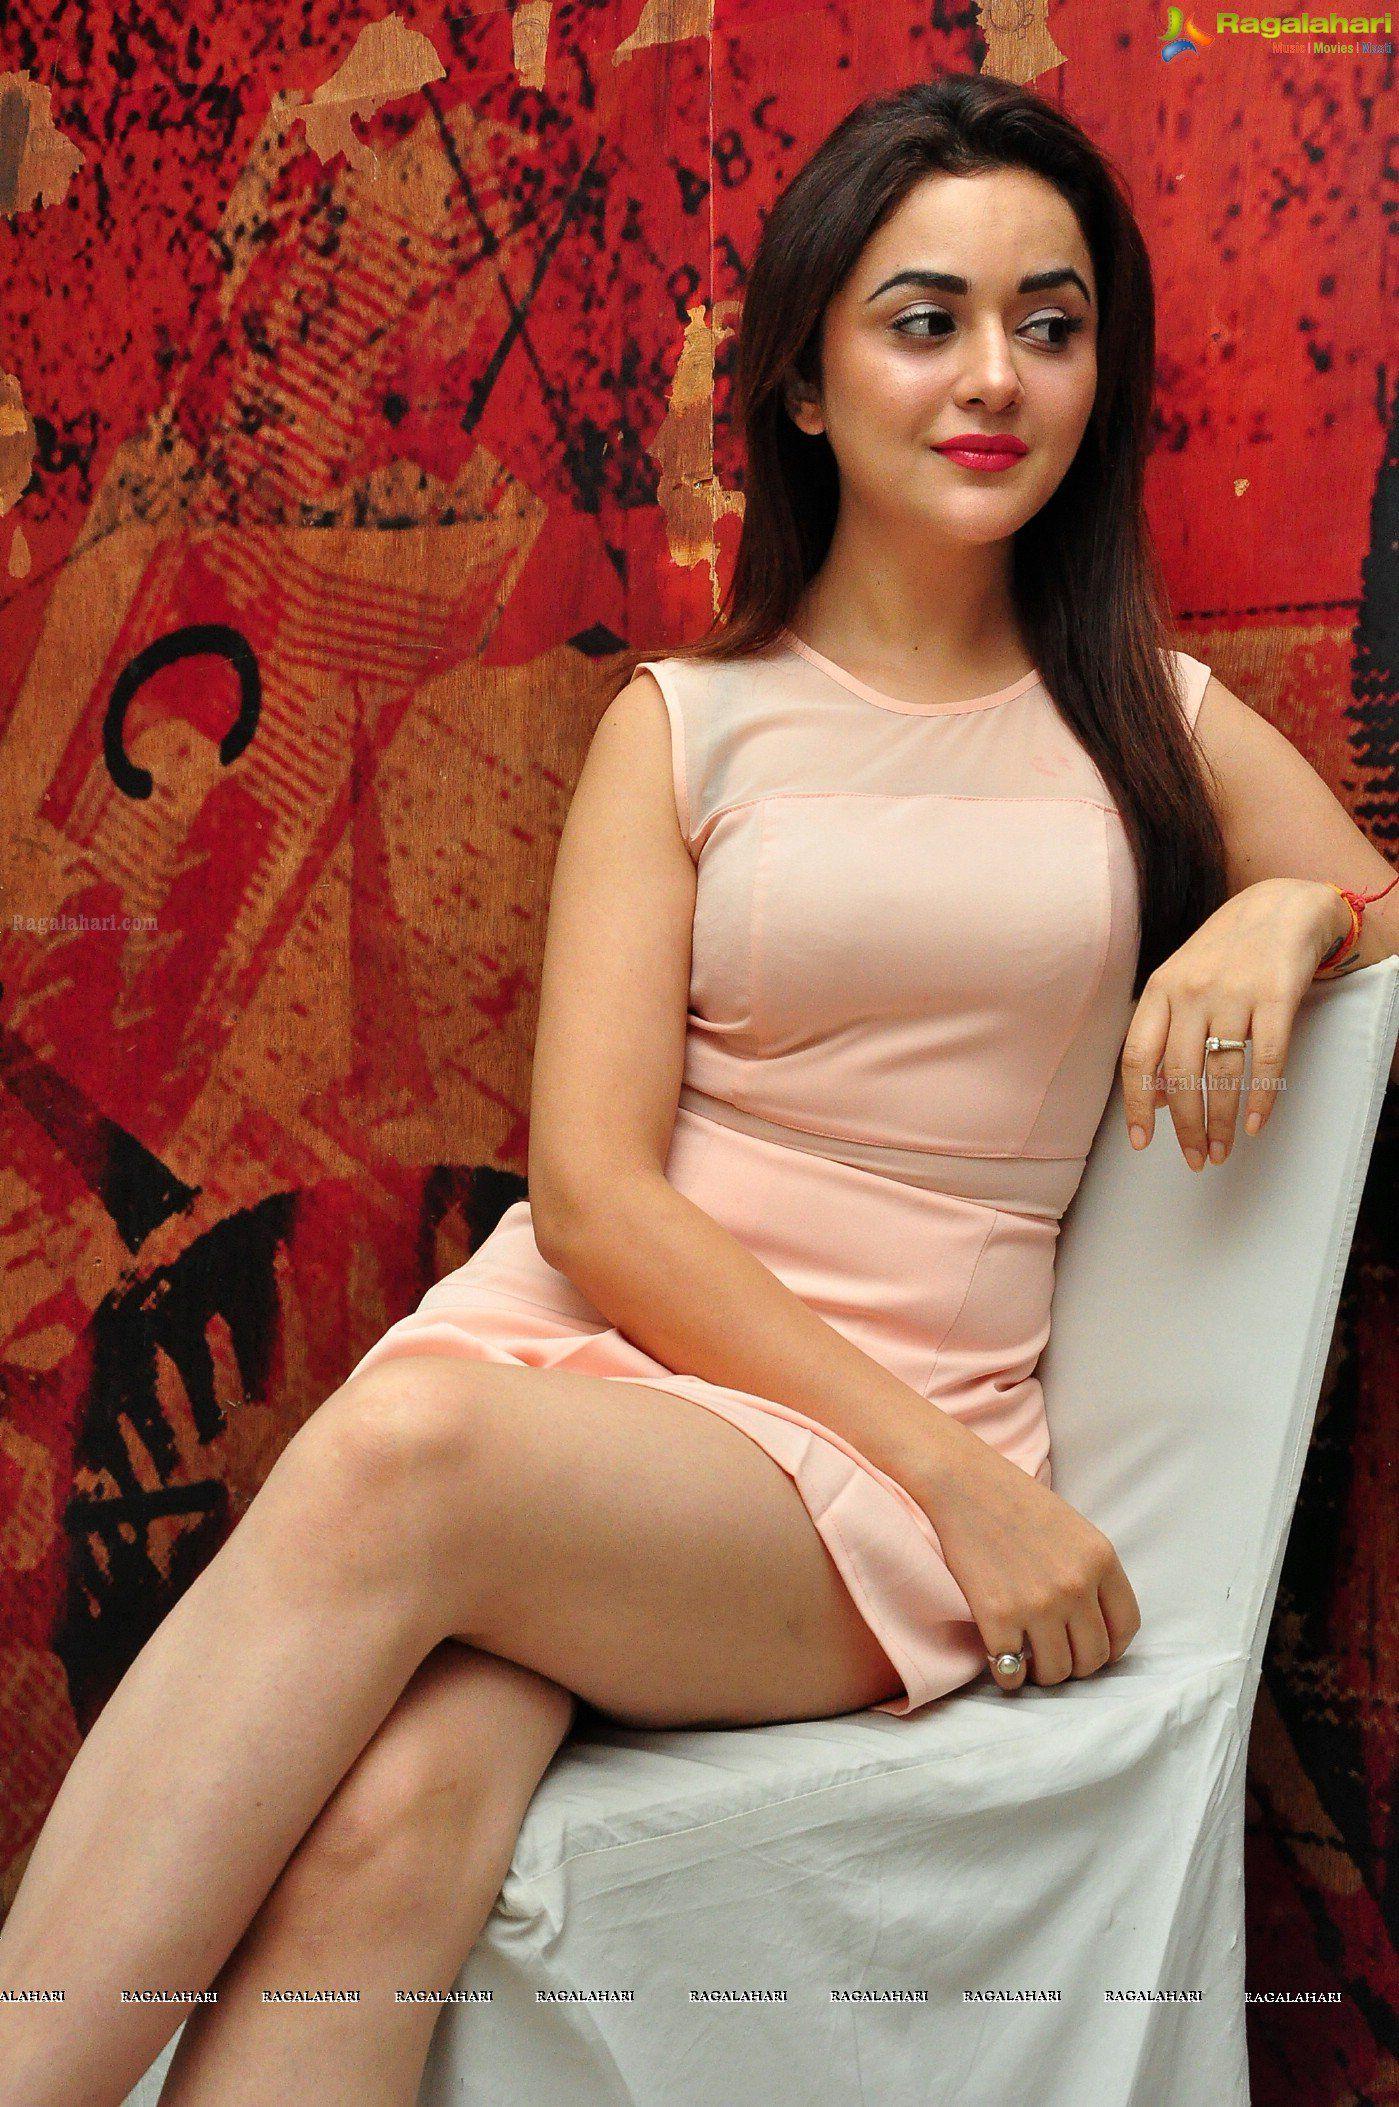 Tits Legs Sanghamitra  nude (75 photos), Facebook, braless